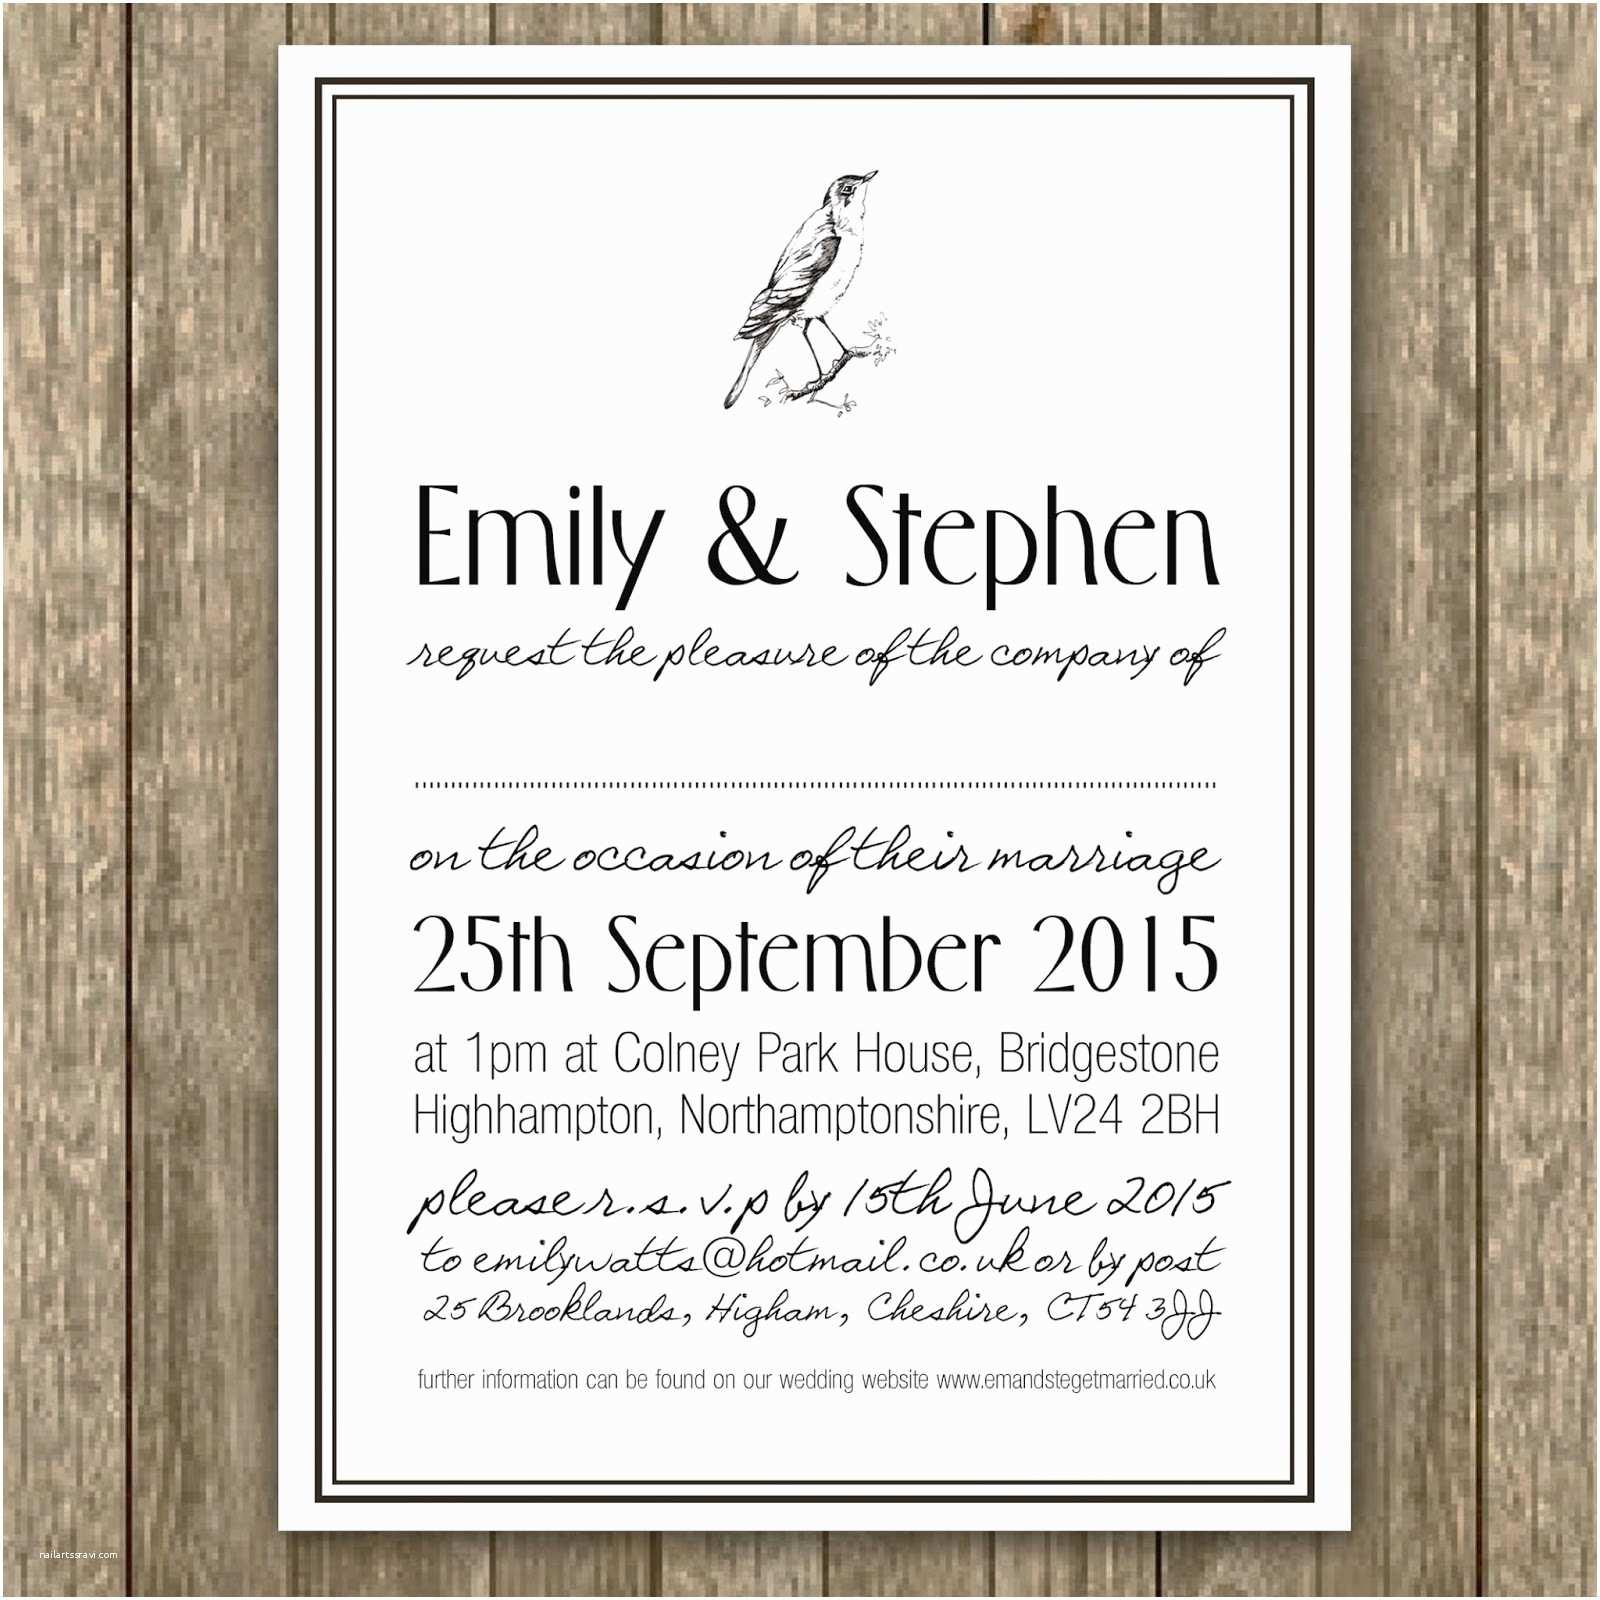 Digital Wedding Invitations Create Own Digital Wedding Invitations Ideas